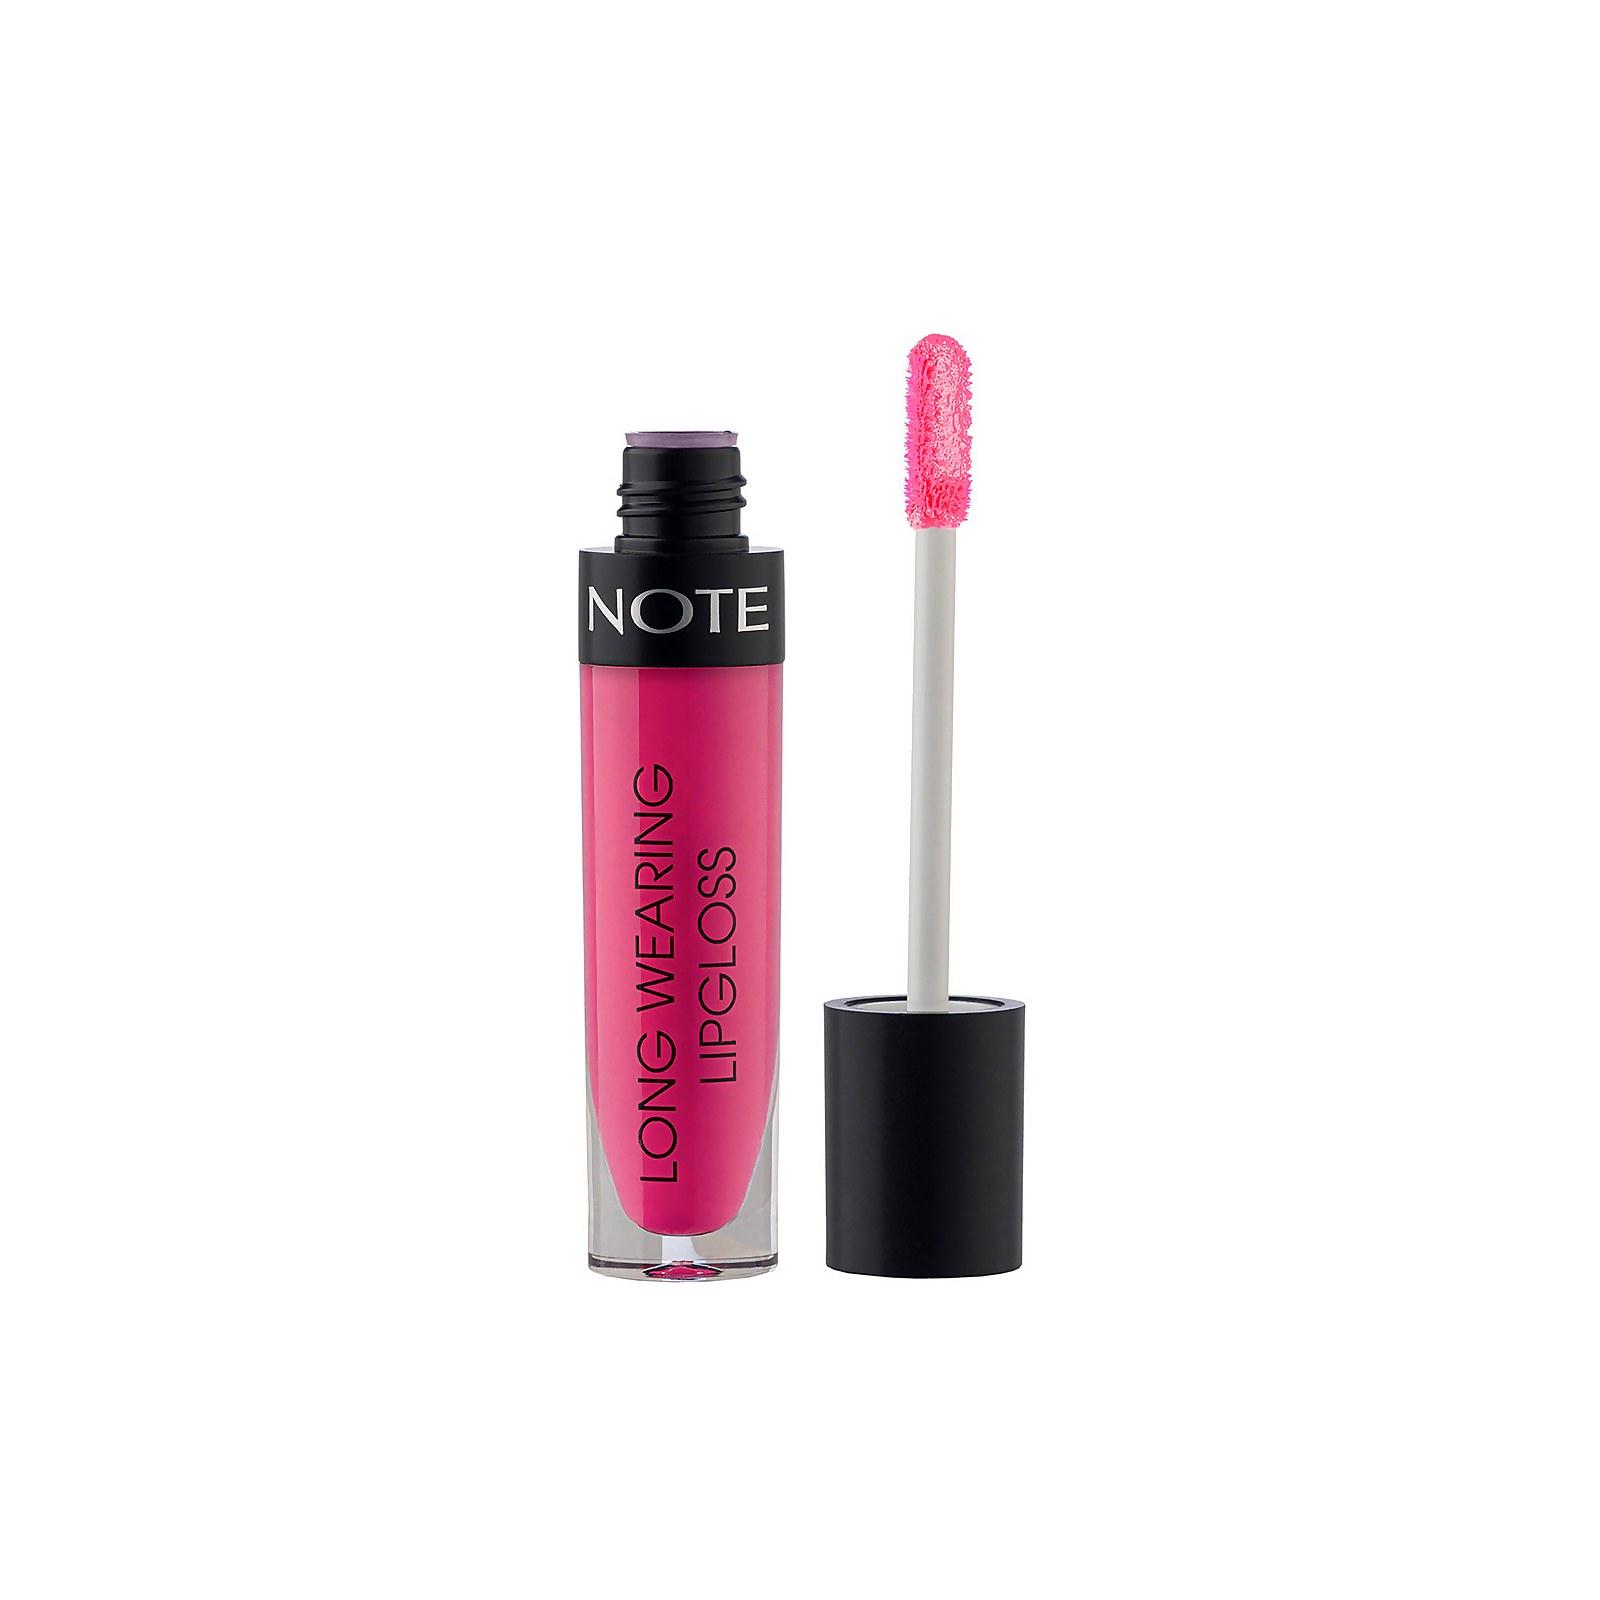 Купить Note Cosmetics Long Wearing Lip Gloss 6ml (Various Shades) - 15 French Rose